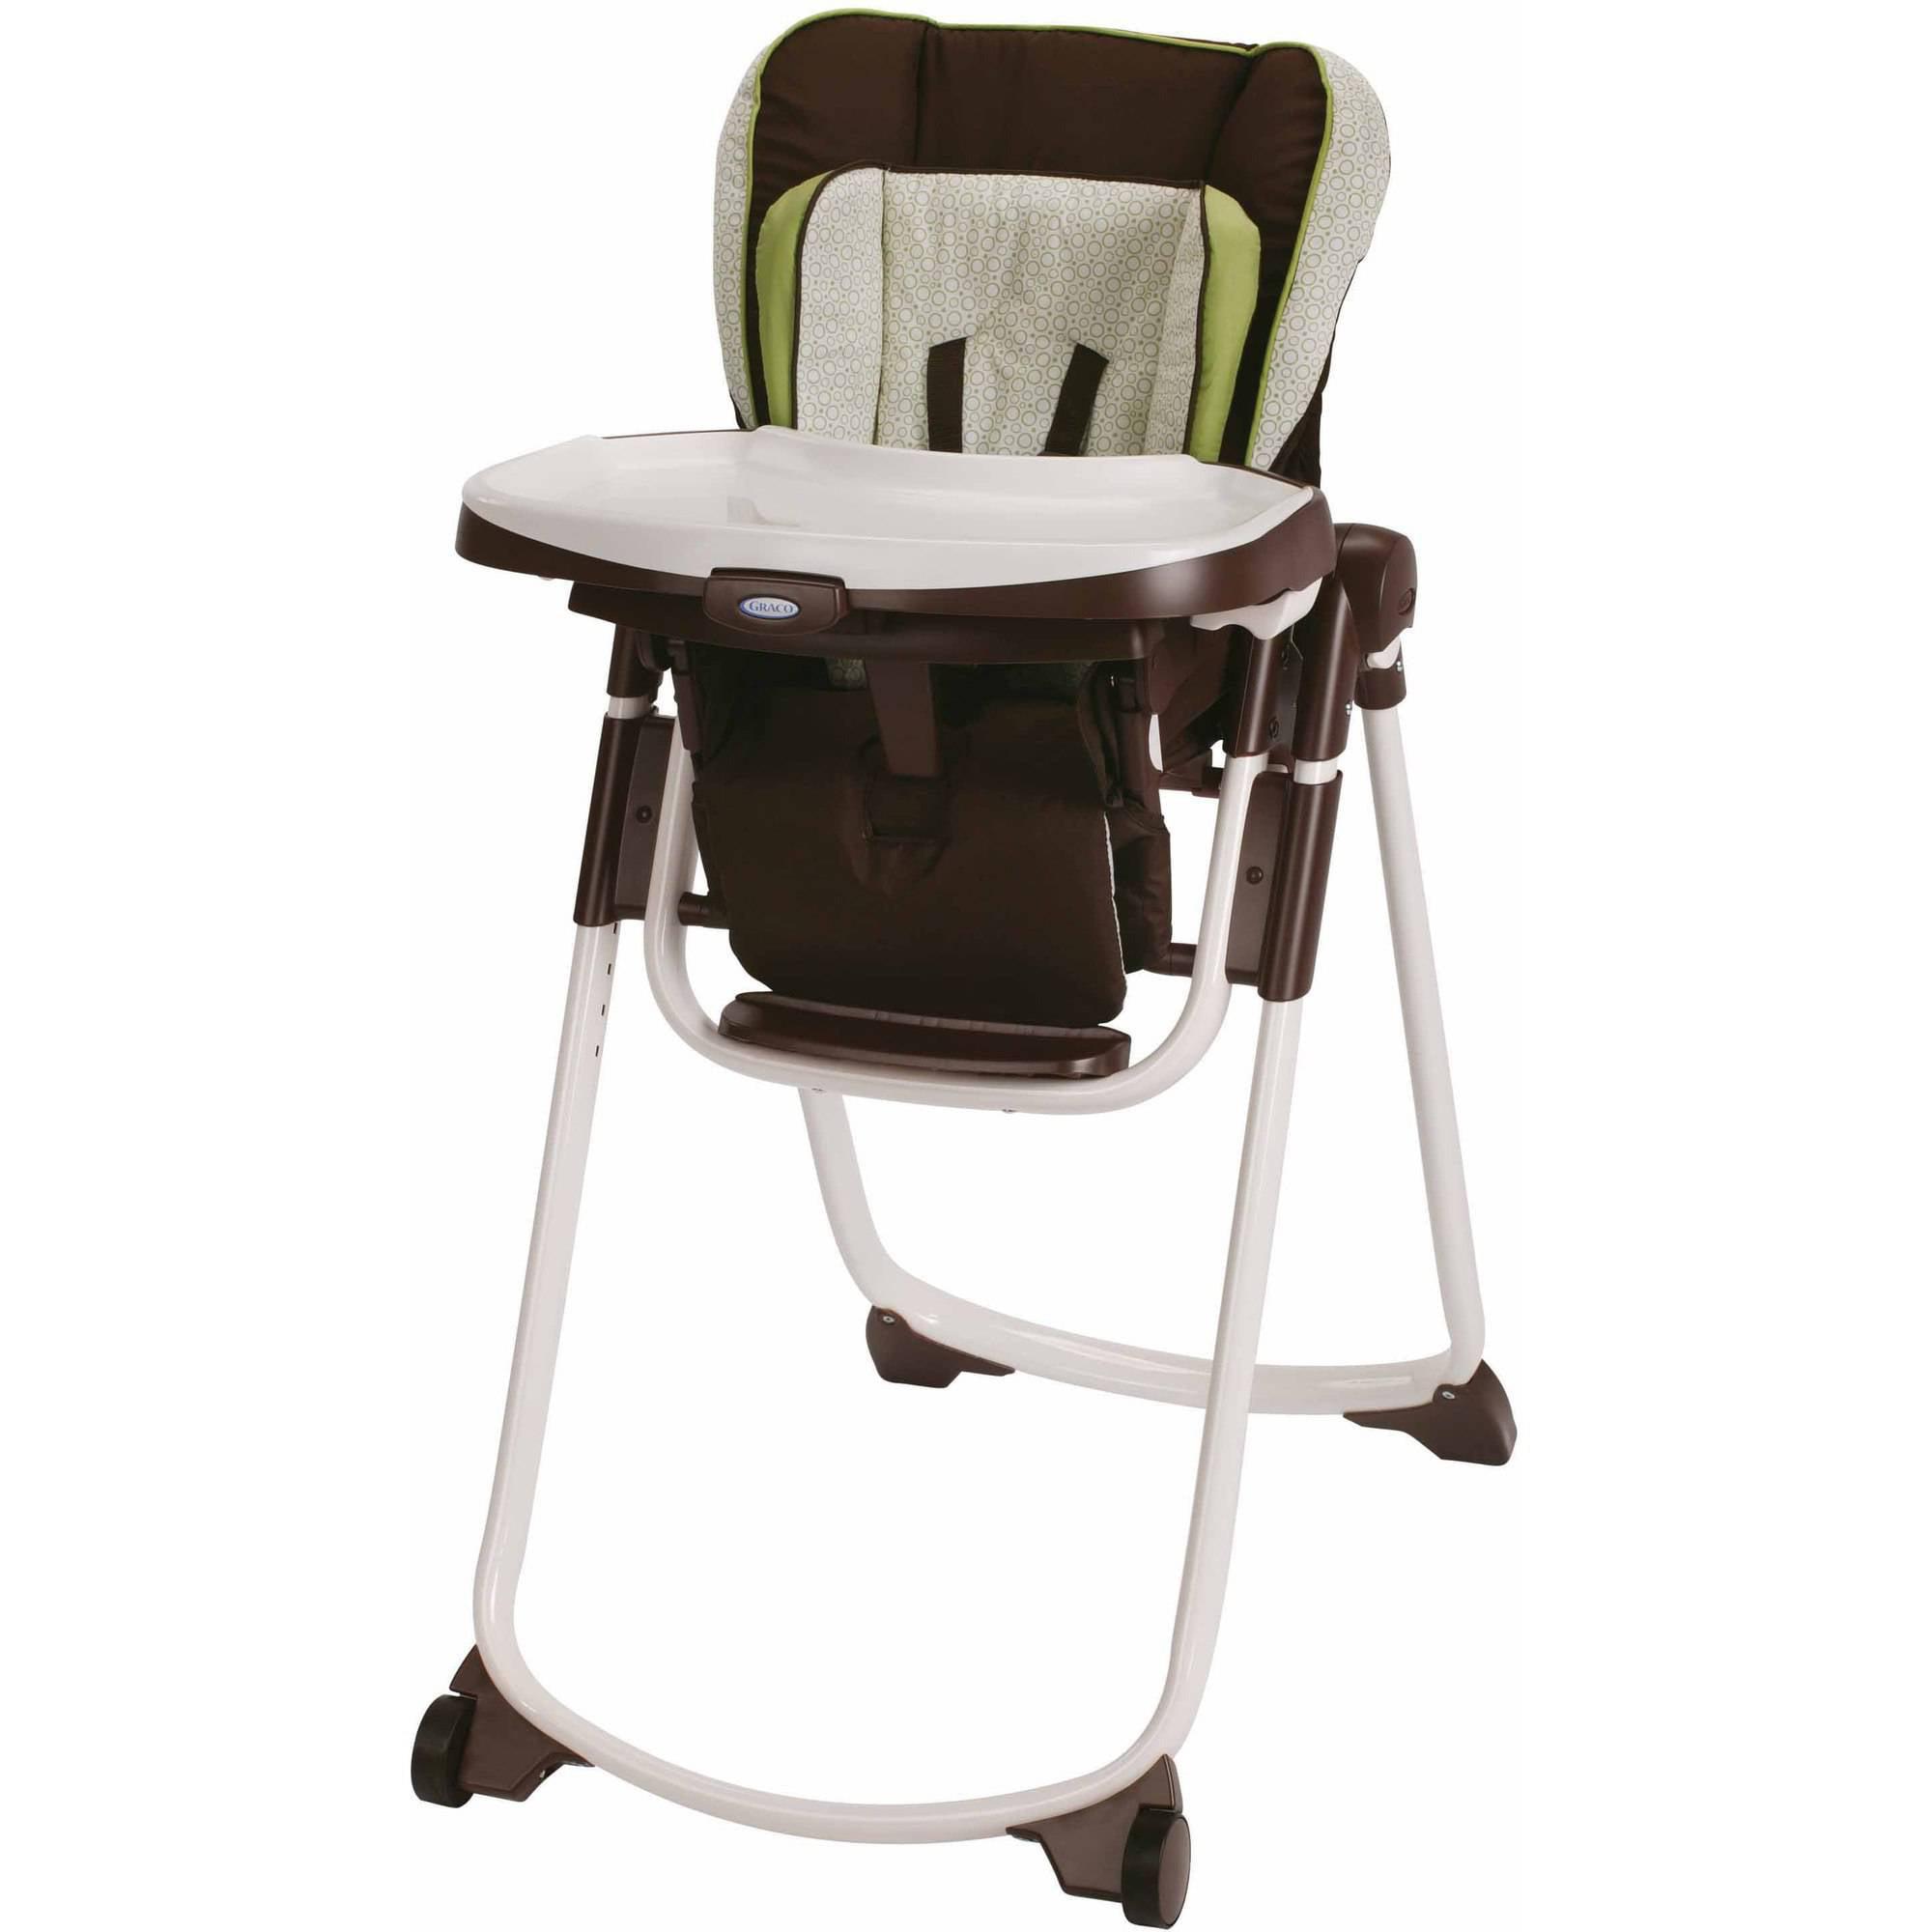 Graco Slim Spaces Space Saver High Chair, Go Green